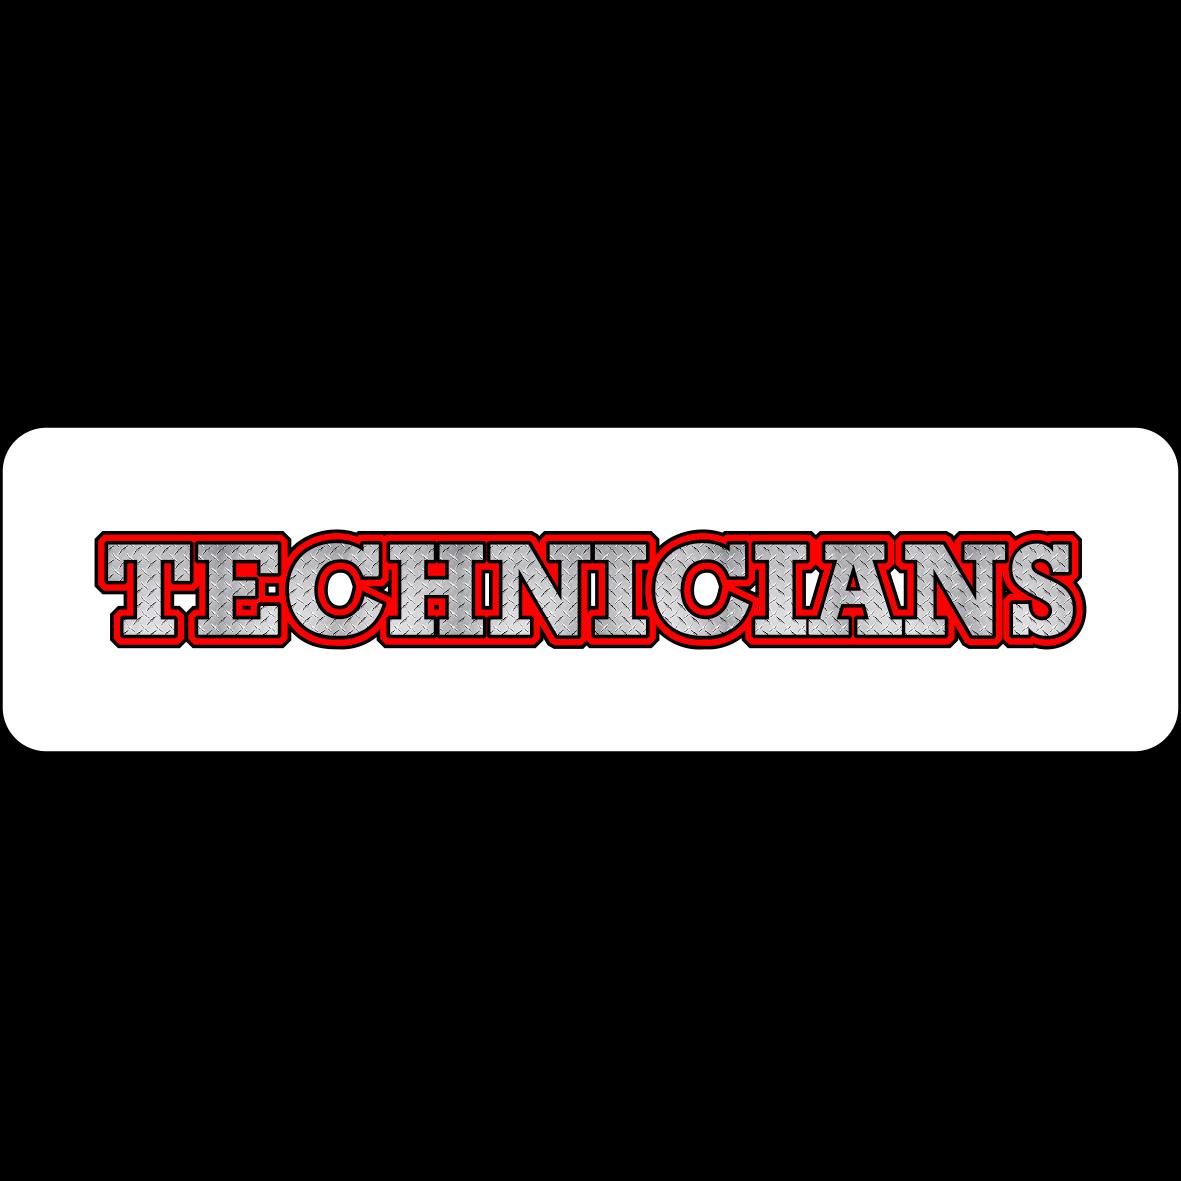 Technicians 2.png